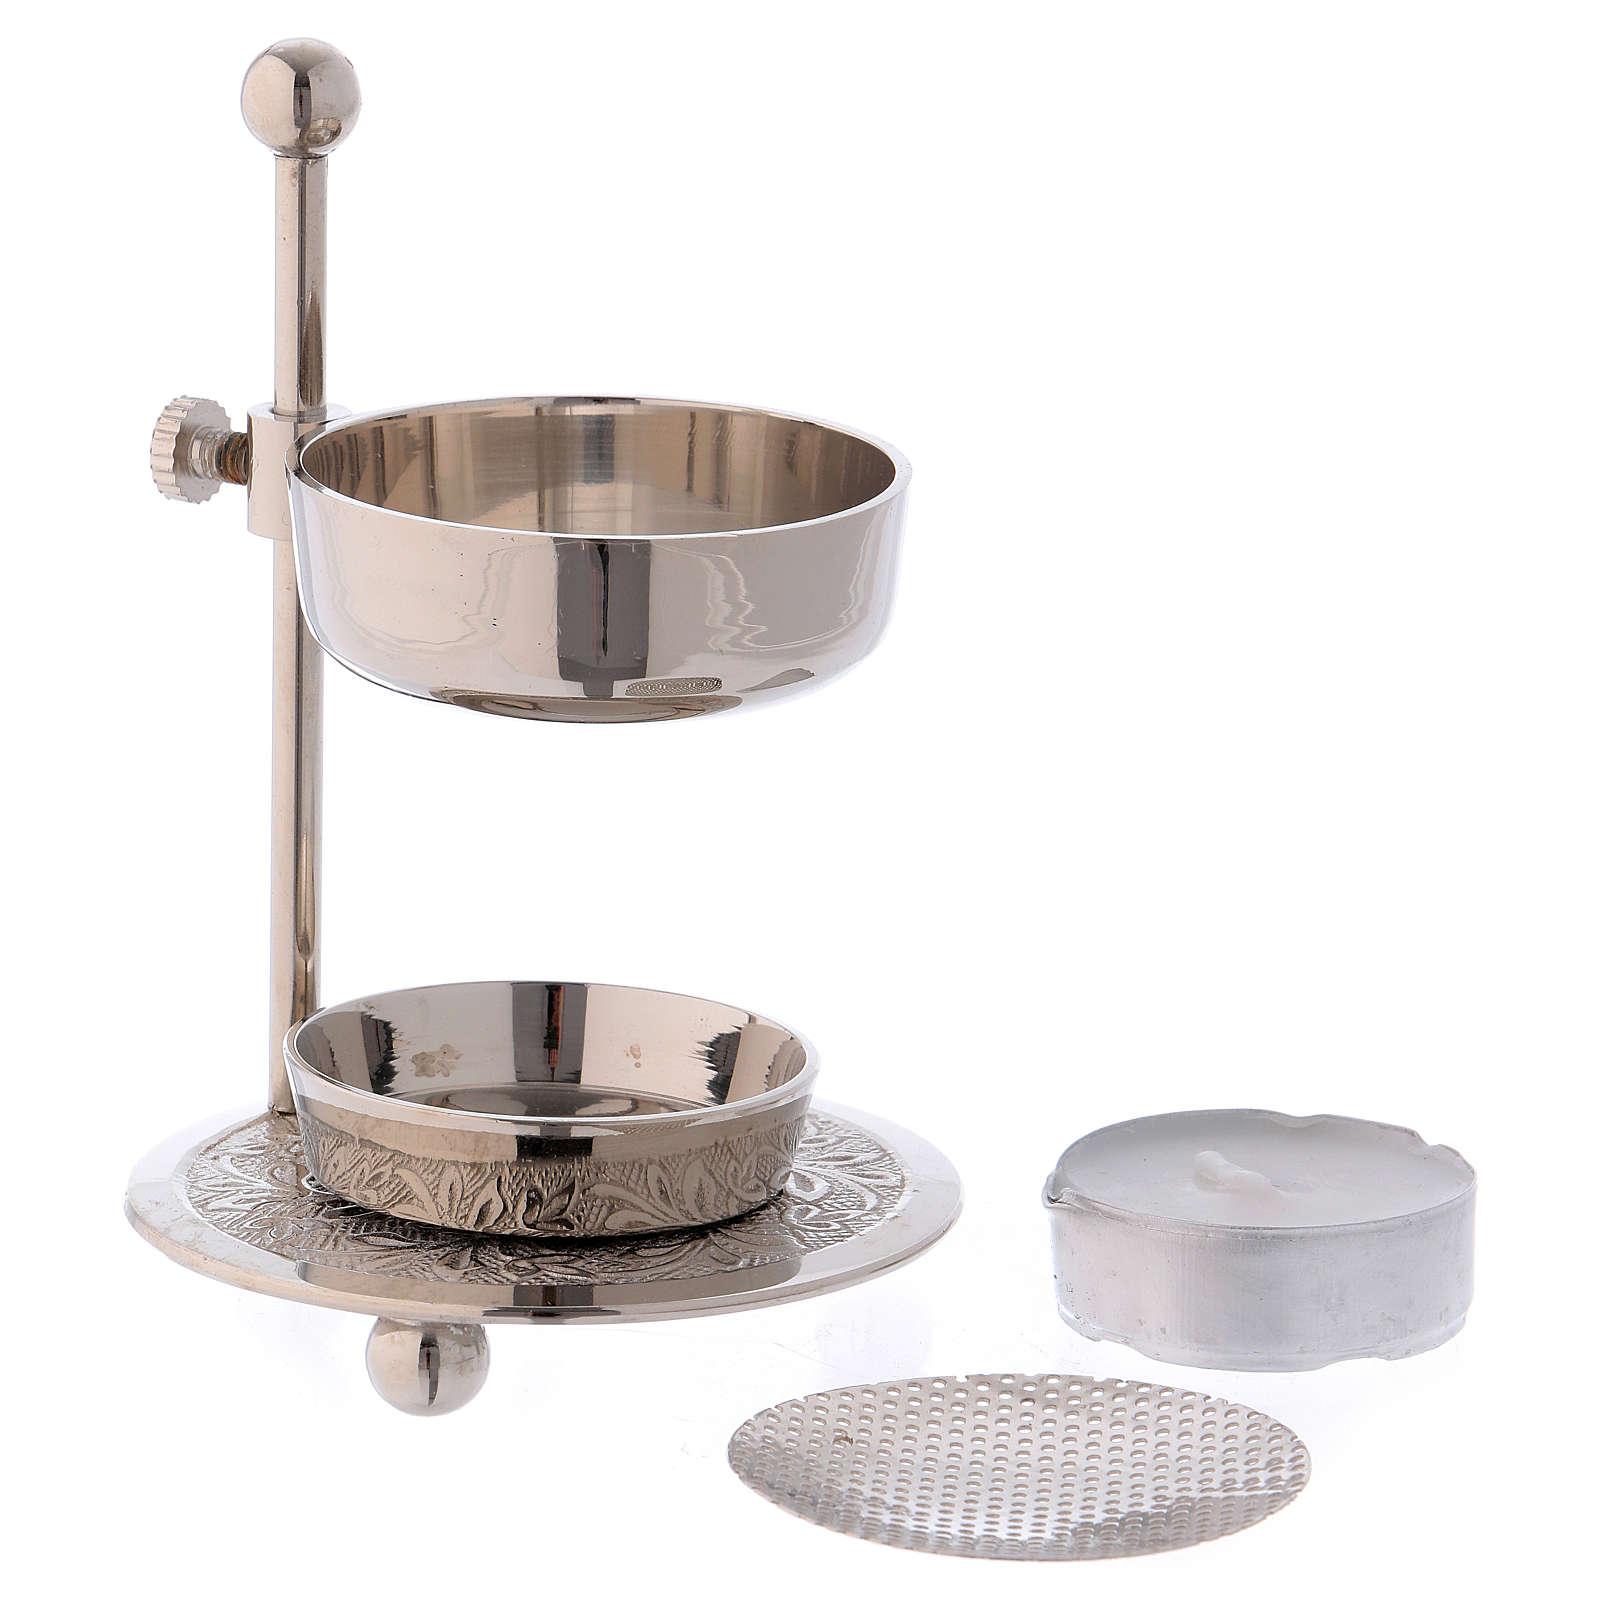 Incense burner in silver-plated brass 11 cm 3